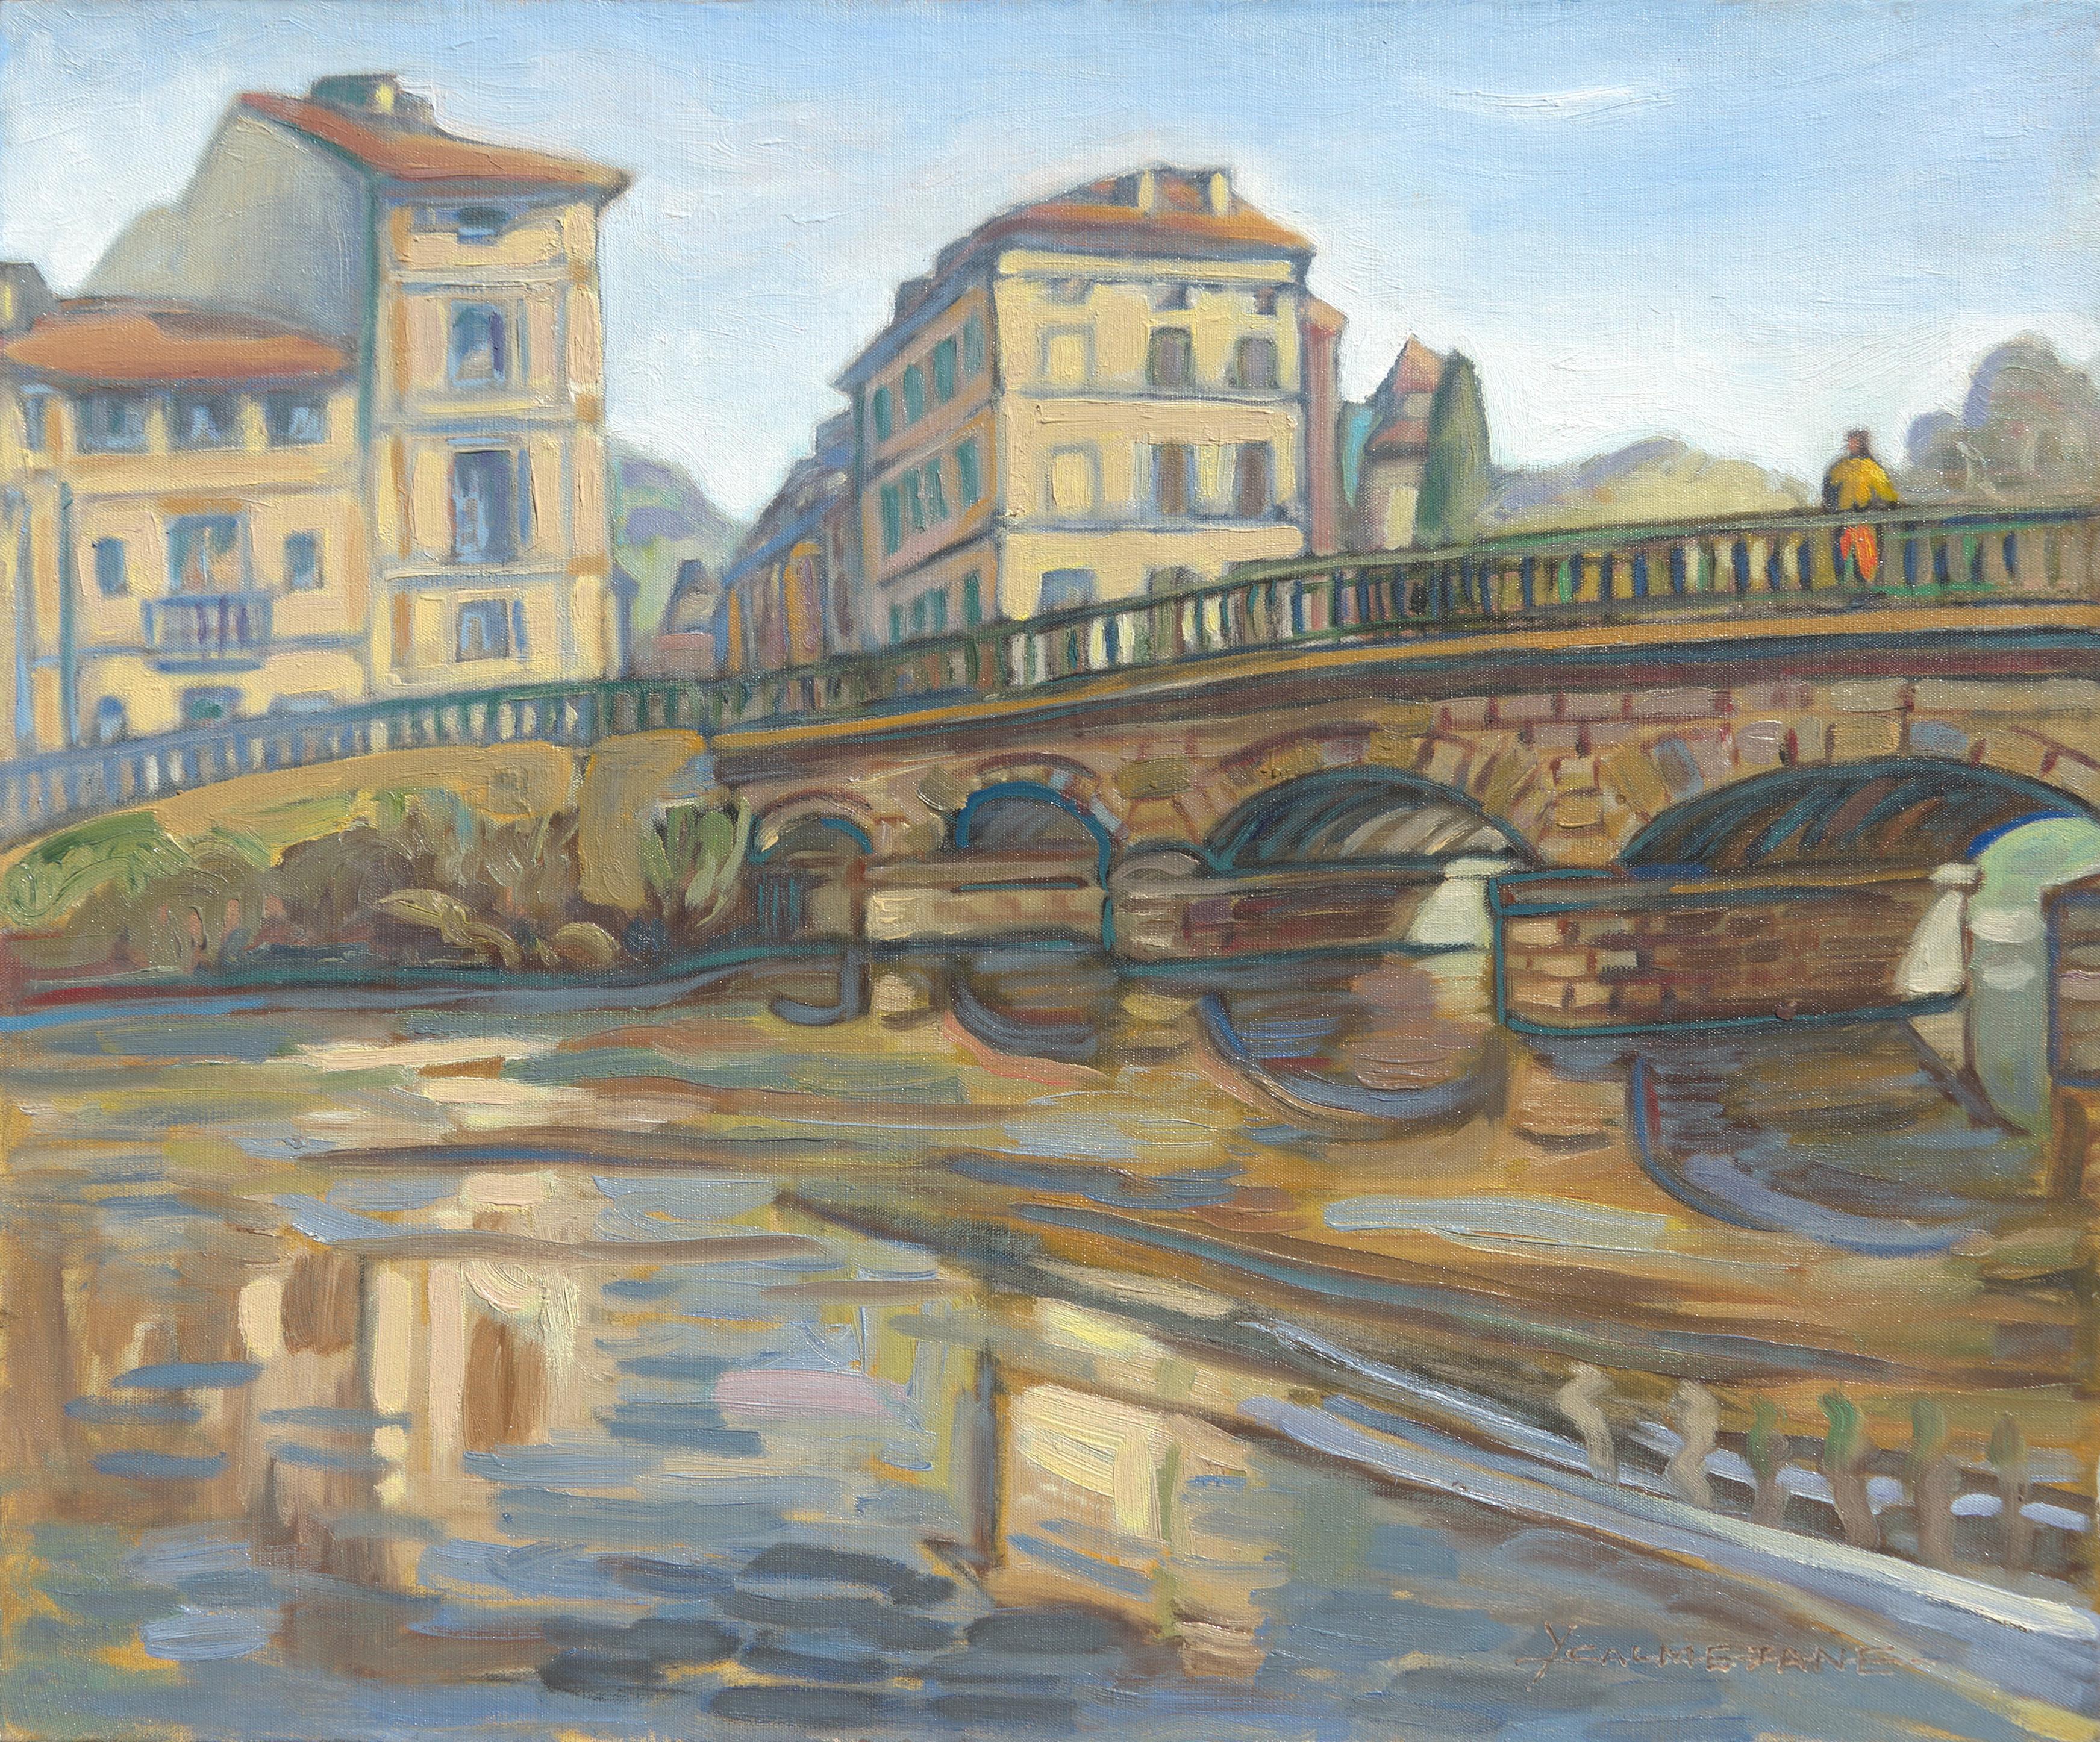 """Brantôme's Bridge"", River and Buildings Impressionist Landscape Oil Painting"